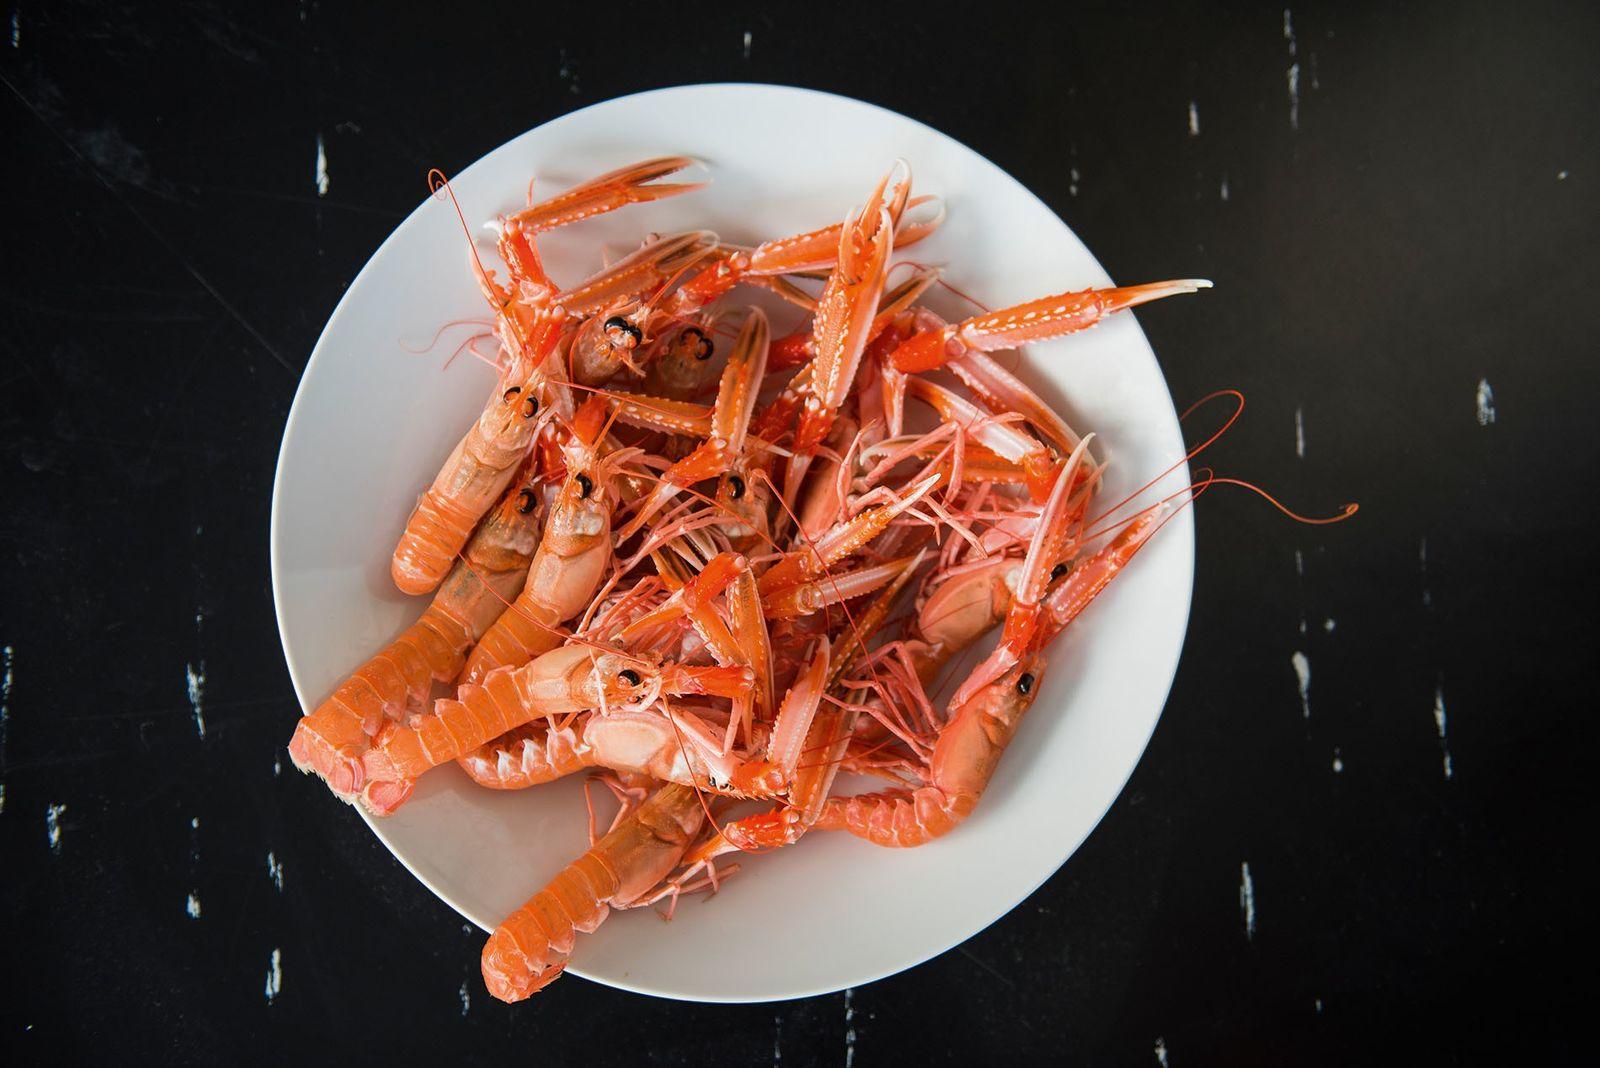 A dish of Hebridean langoustines.